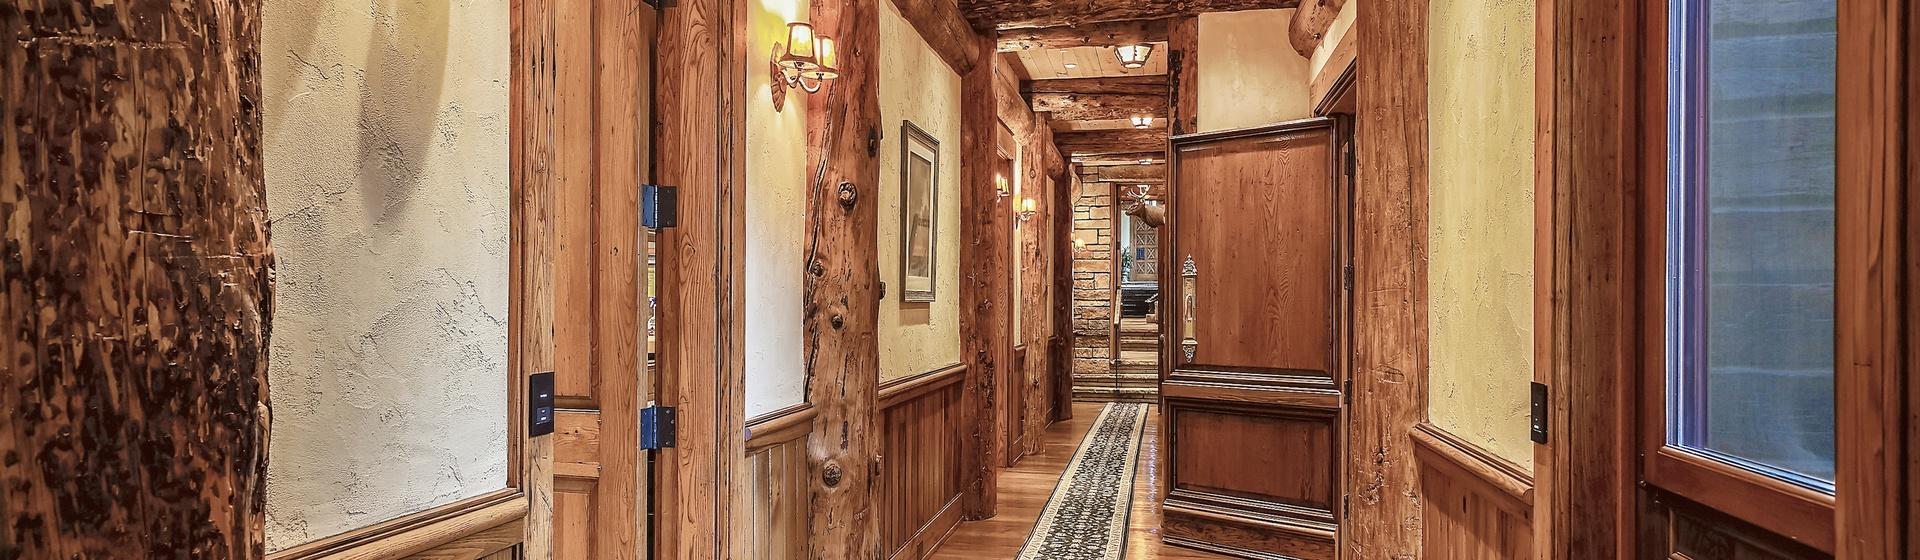 10.9-Telluride-Sleeping-Indian-Ranch-lower-level-hallway-web.JPG